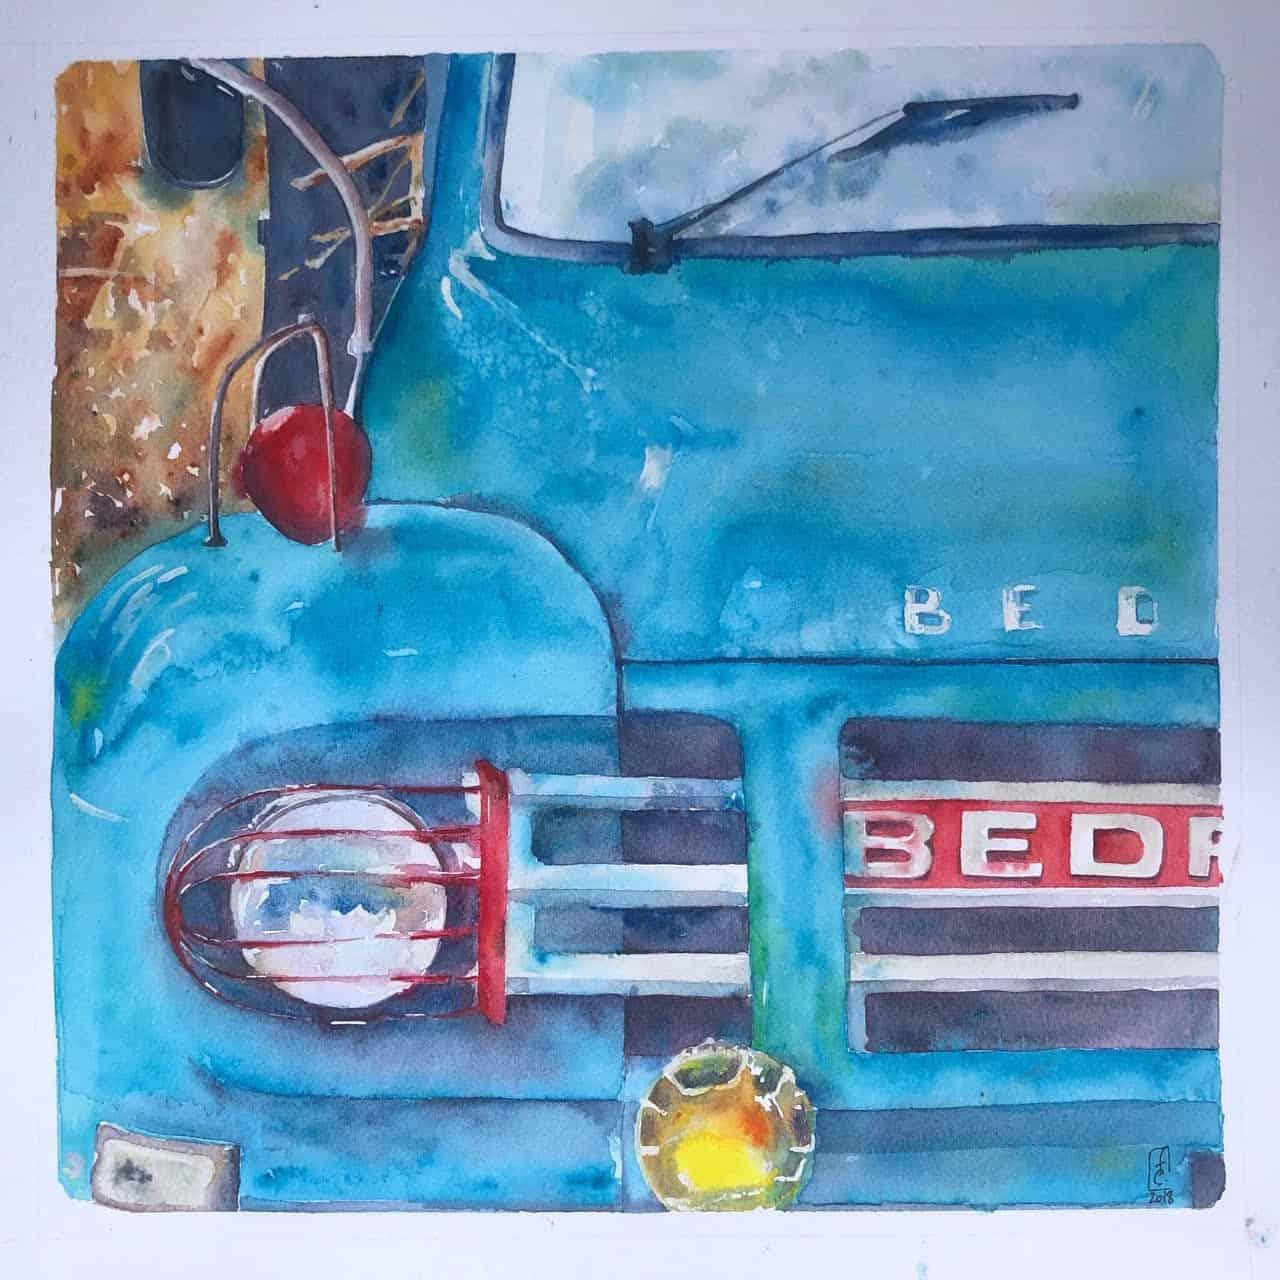 blue-bedford-frederique-cerafinn-mauritian-artist